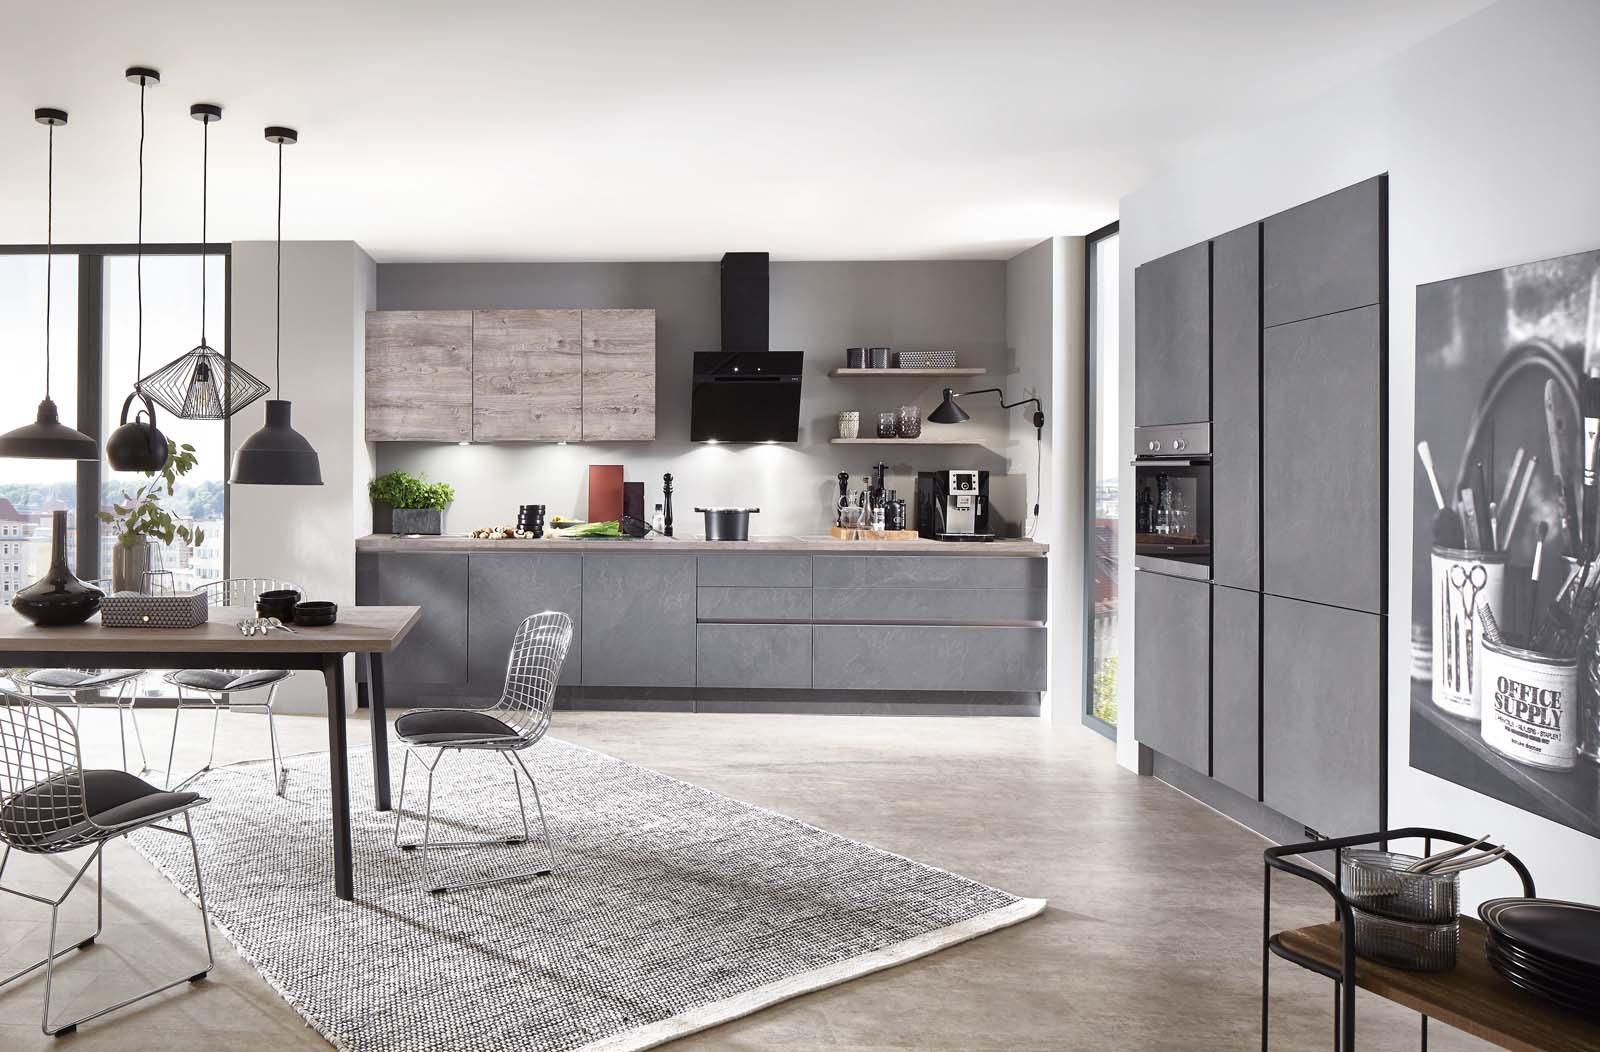 stoneart verle. Black Bedroom Furniture Sets. Home Design Ideas